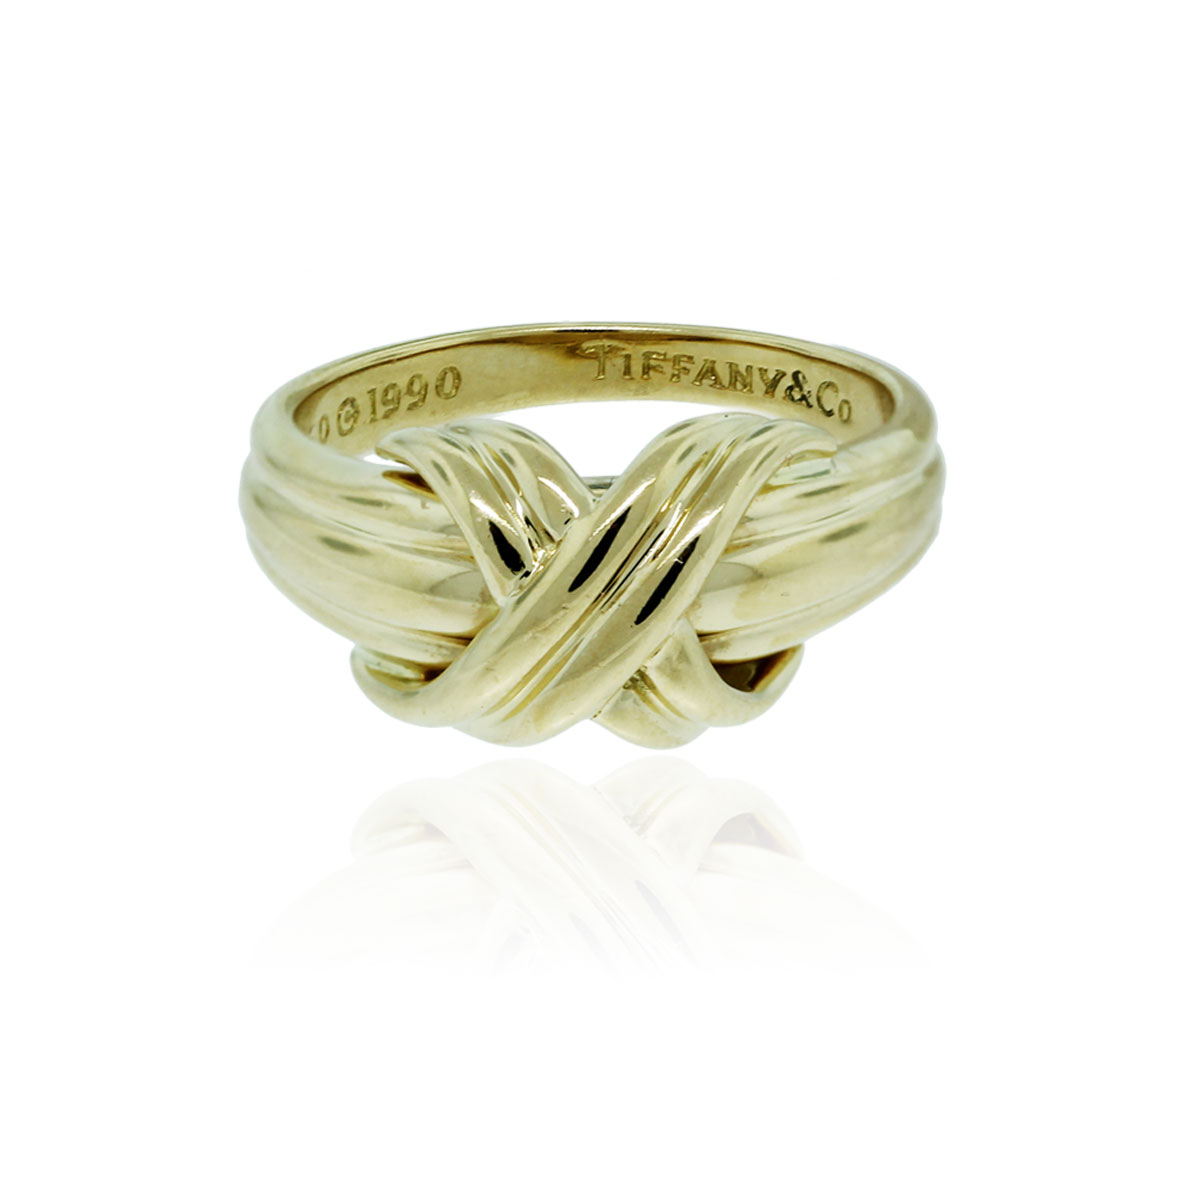 Tiffany Amp Co 18k Yellow Gold Signature X Ring